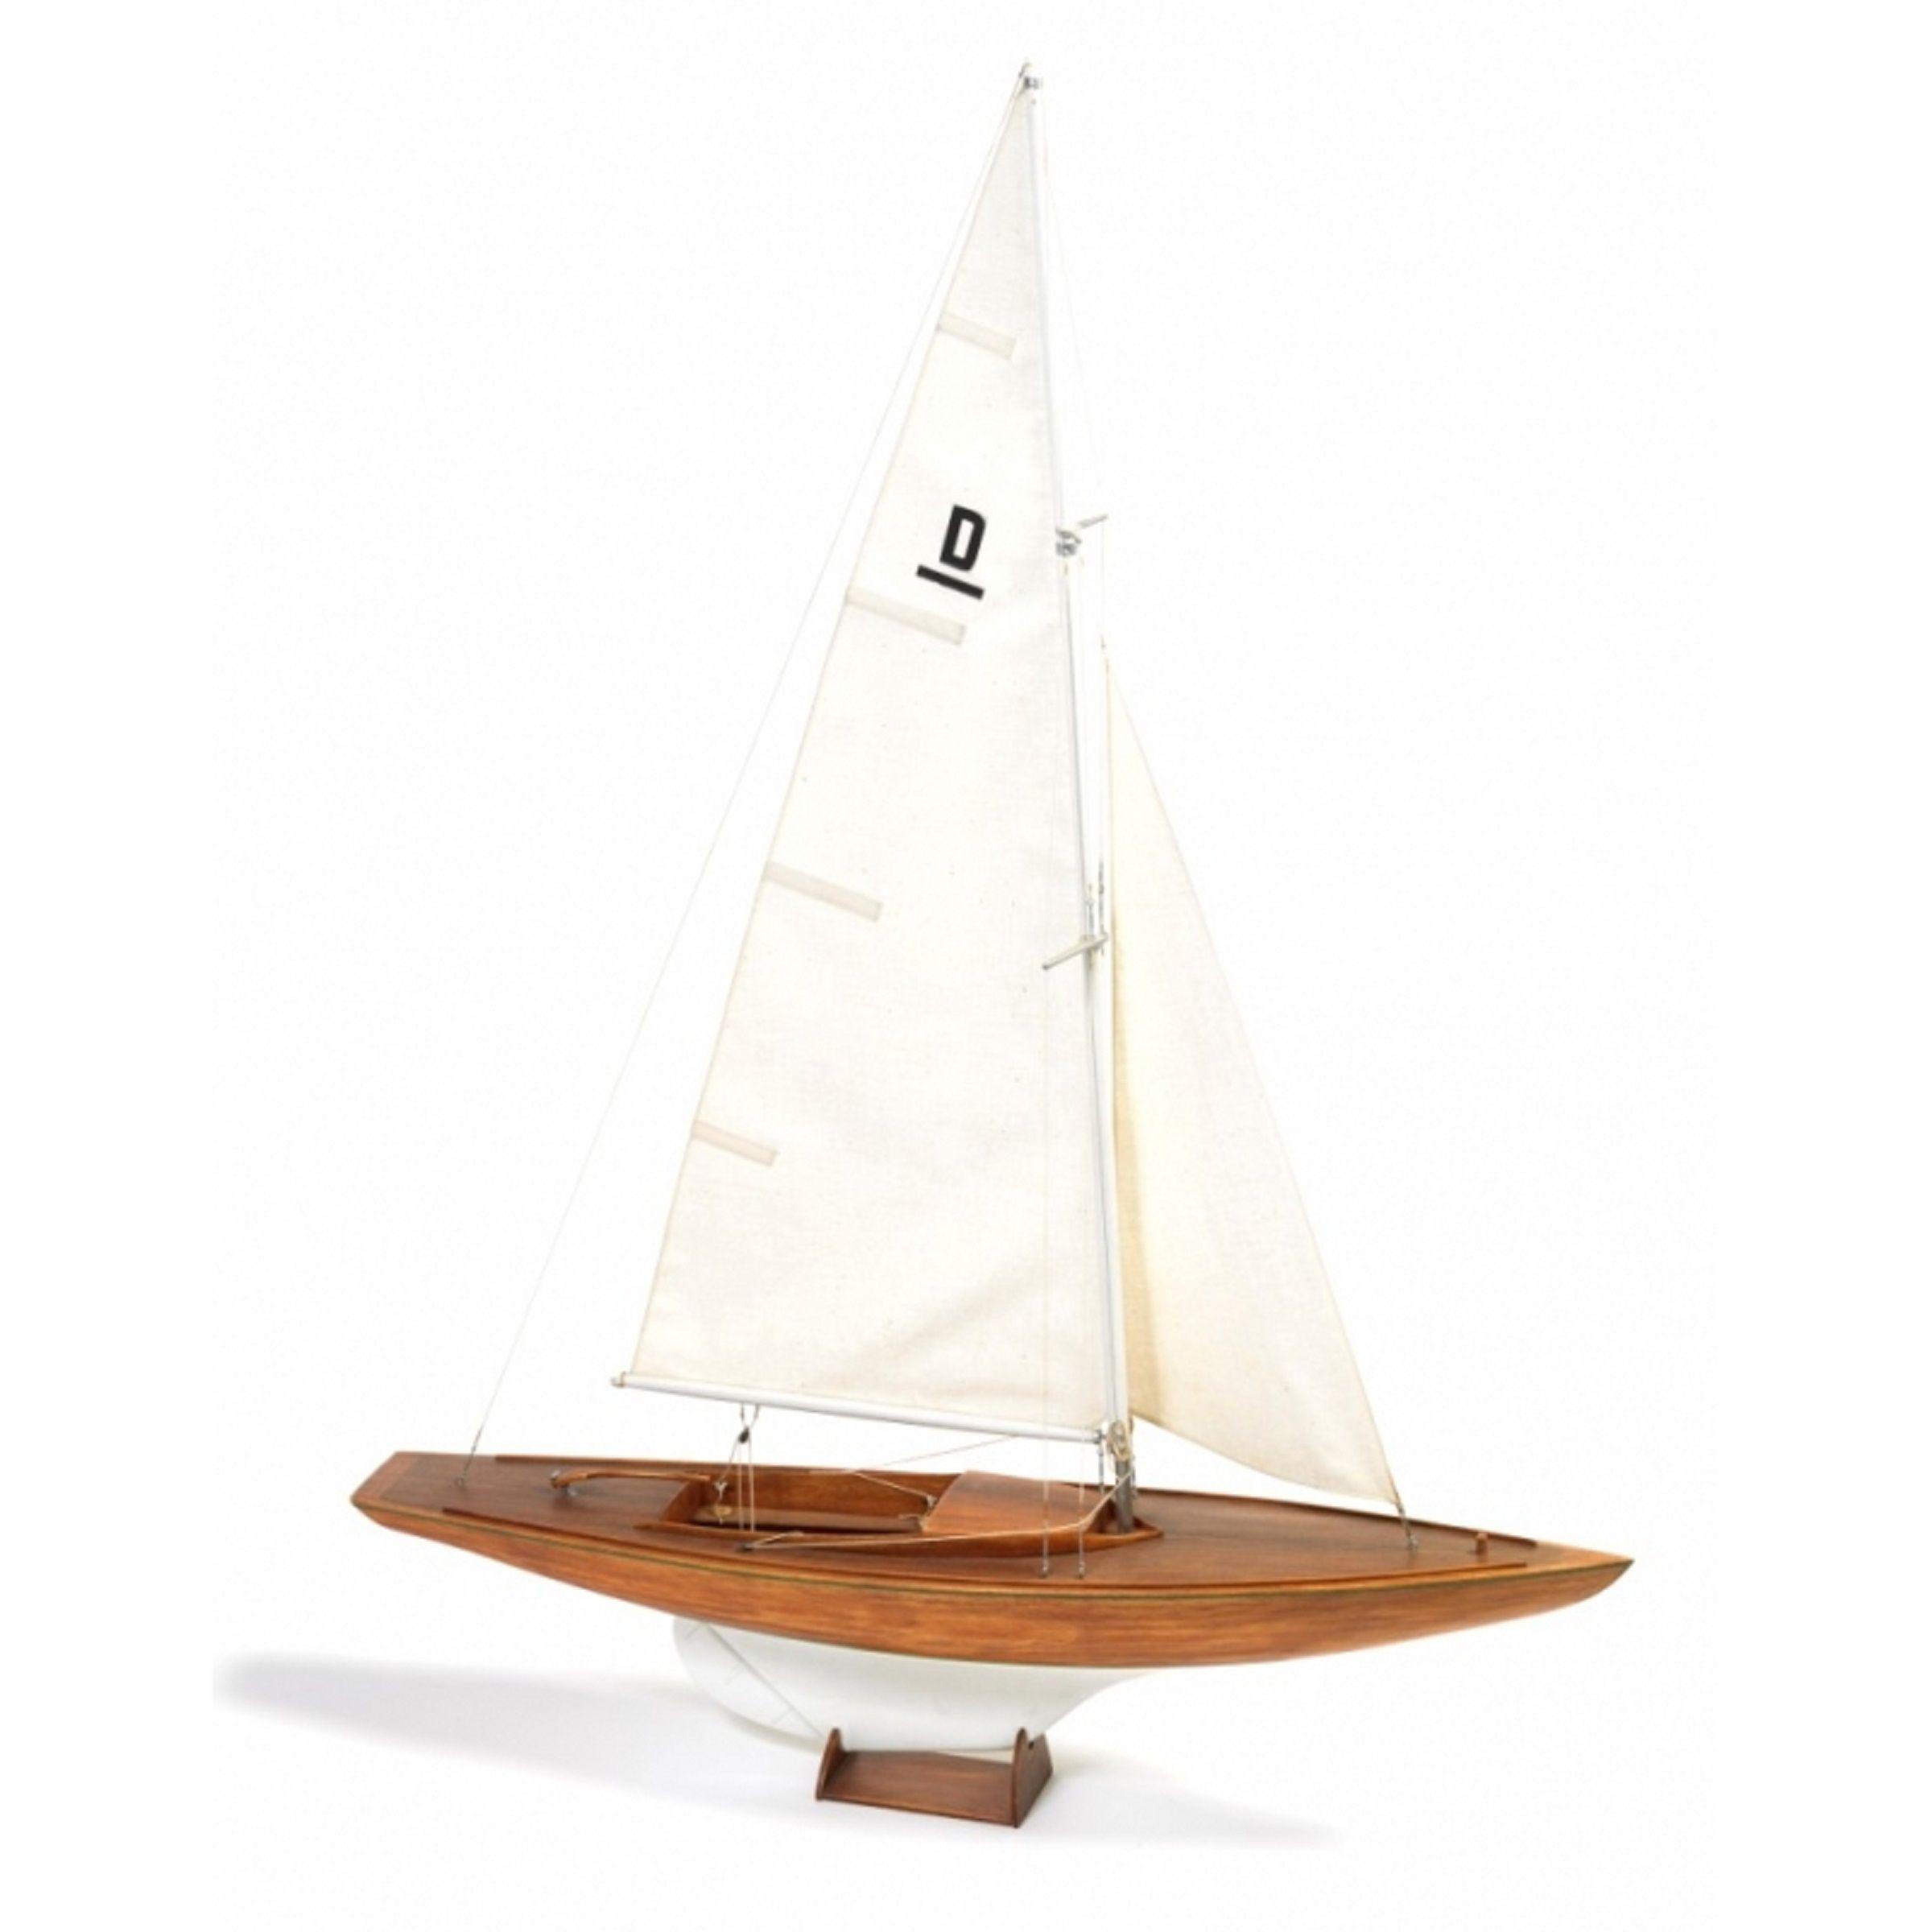 1610-9243-Dragen-Yacht-kit